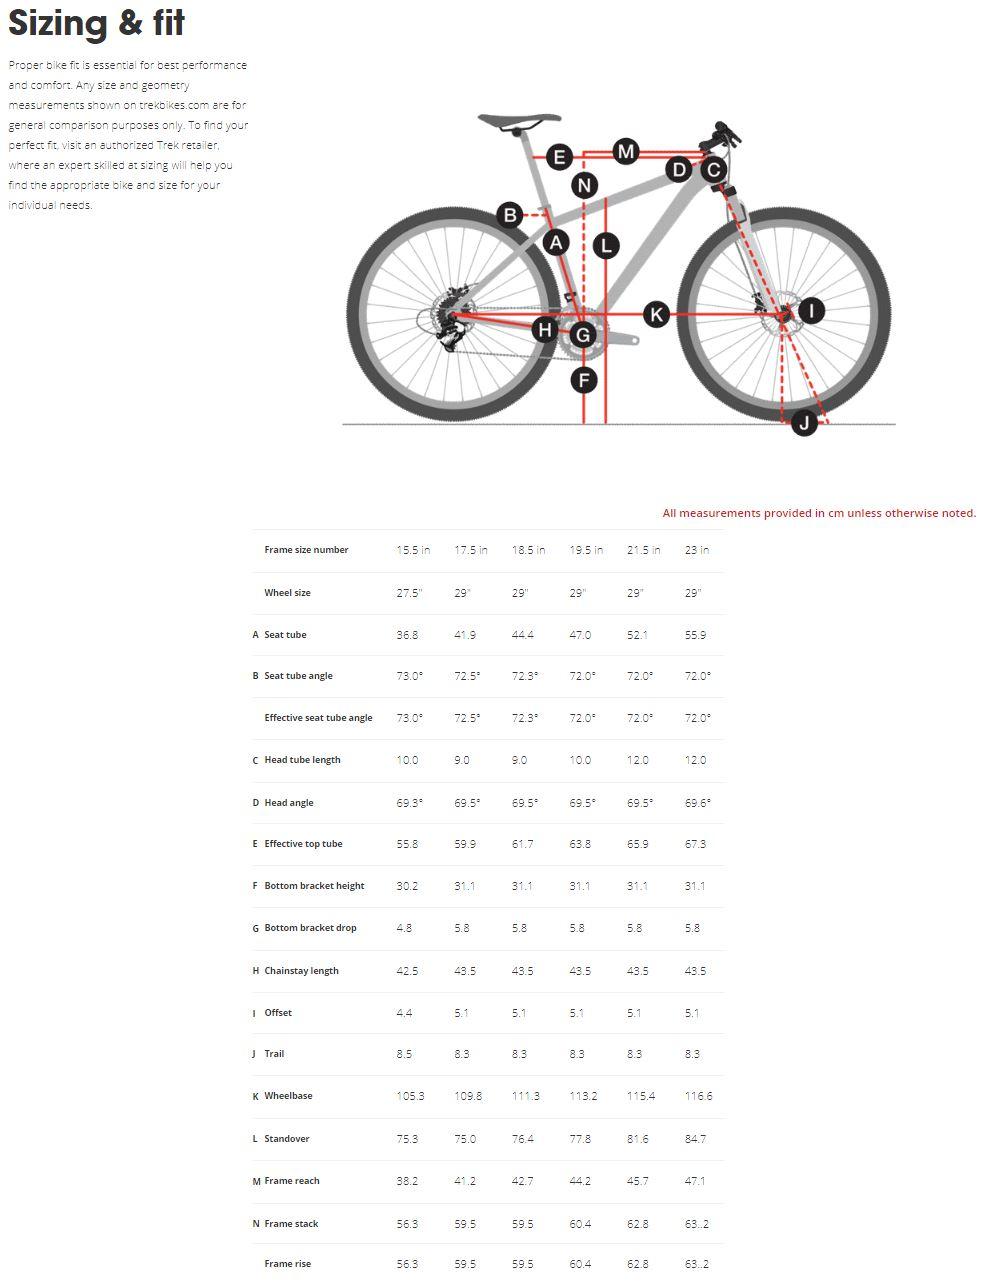 Trek Procaliber geometry chart